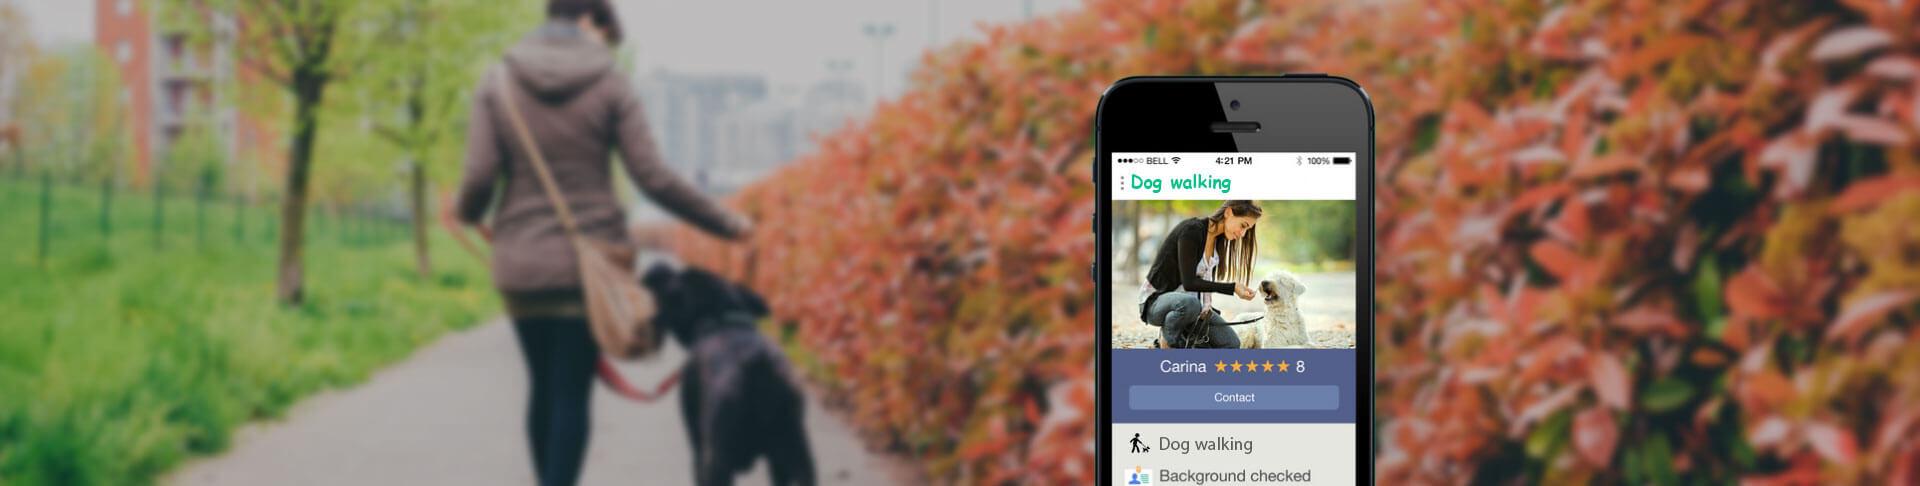 Uber for Dog Walking